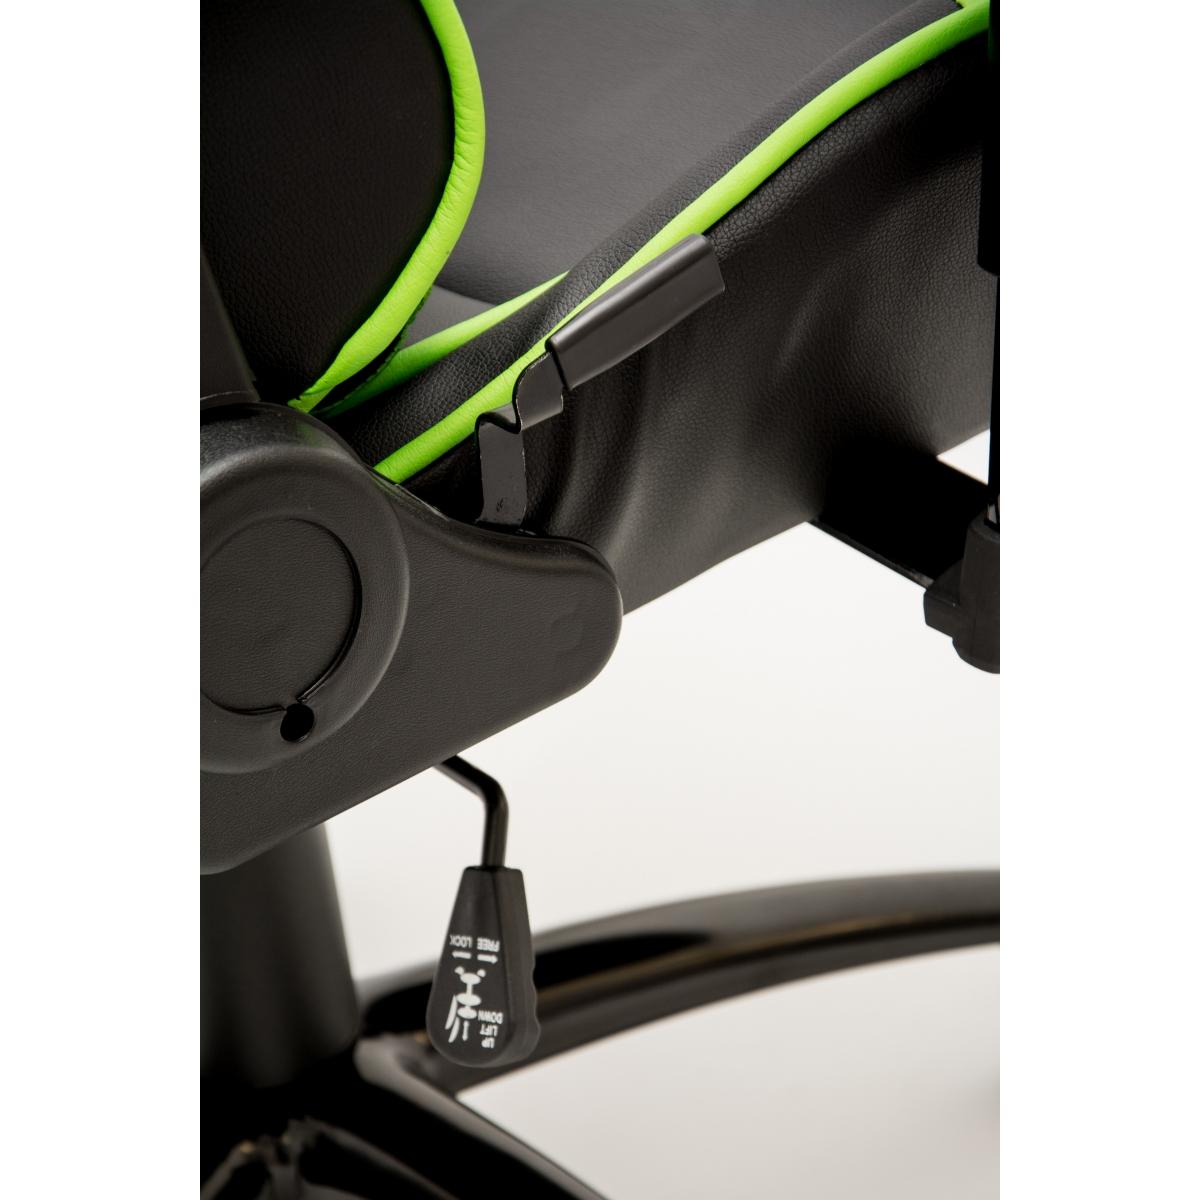 Cadeira Gamer DT3Sports Mizano, Green